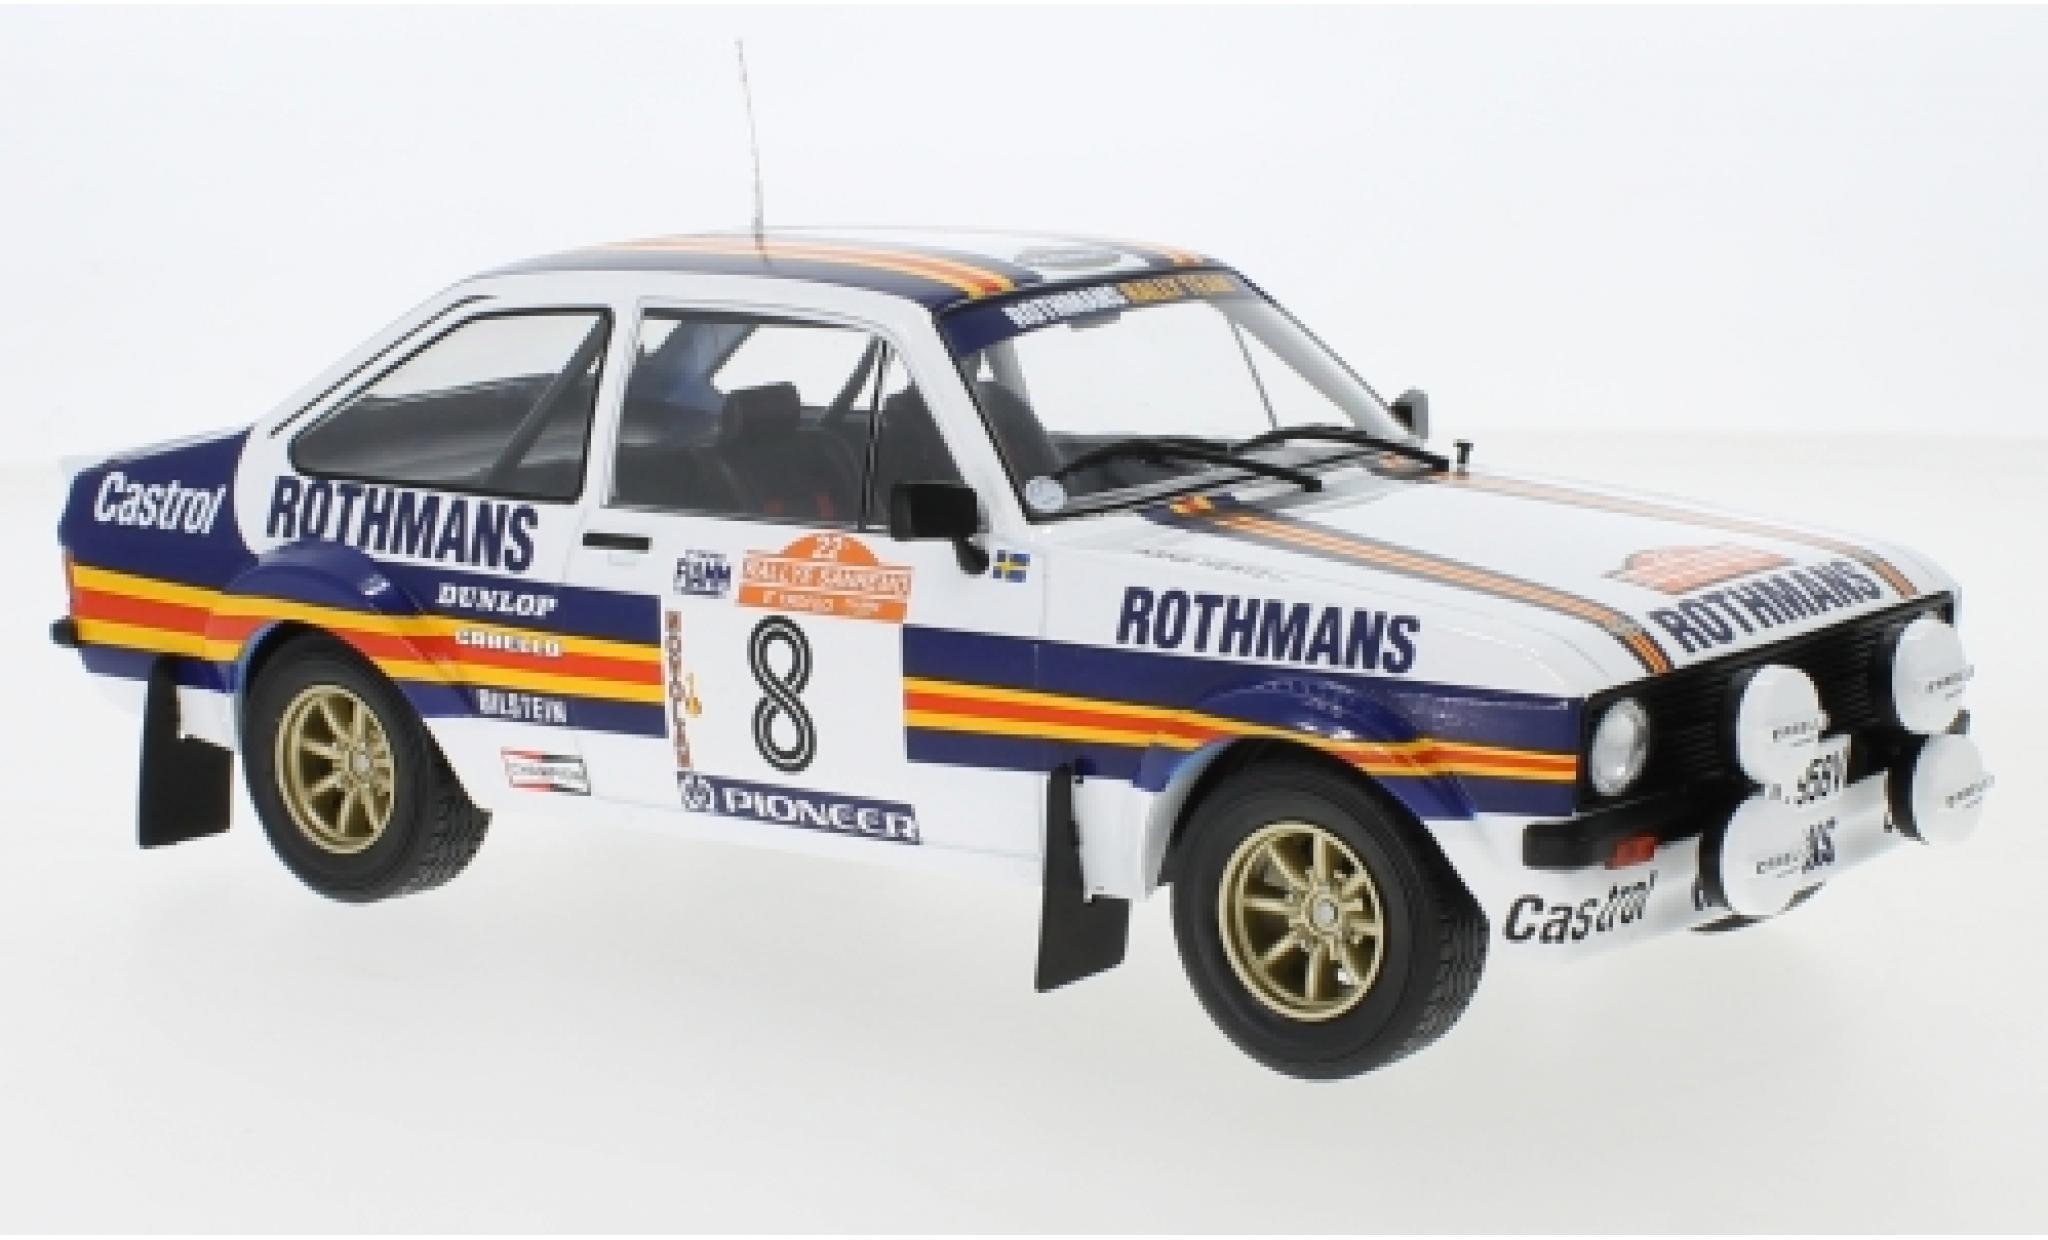 Ford Escort 1/18 IXO MKII RS 1800 No.8 Rothmans Rallye WM Rally San Remo 1980 H.Mikkola/A.Hertz